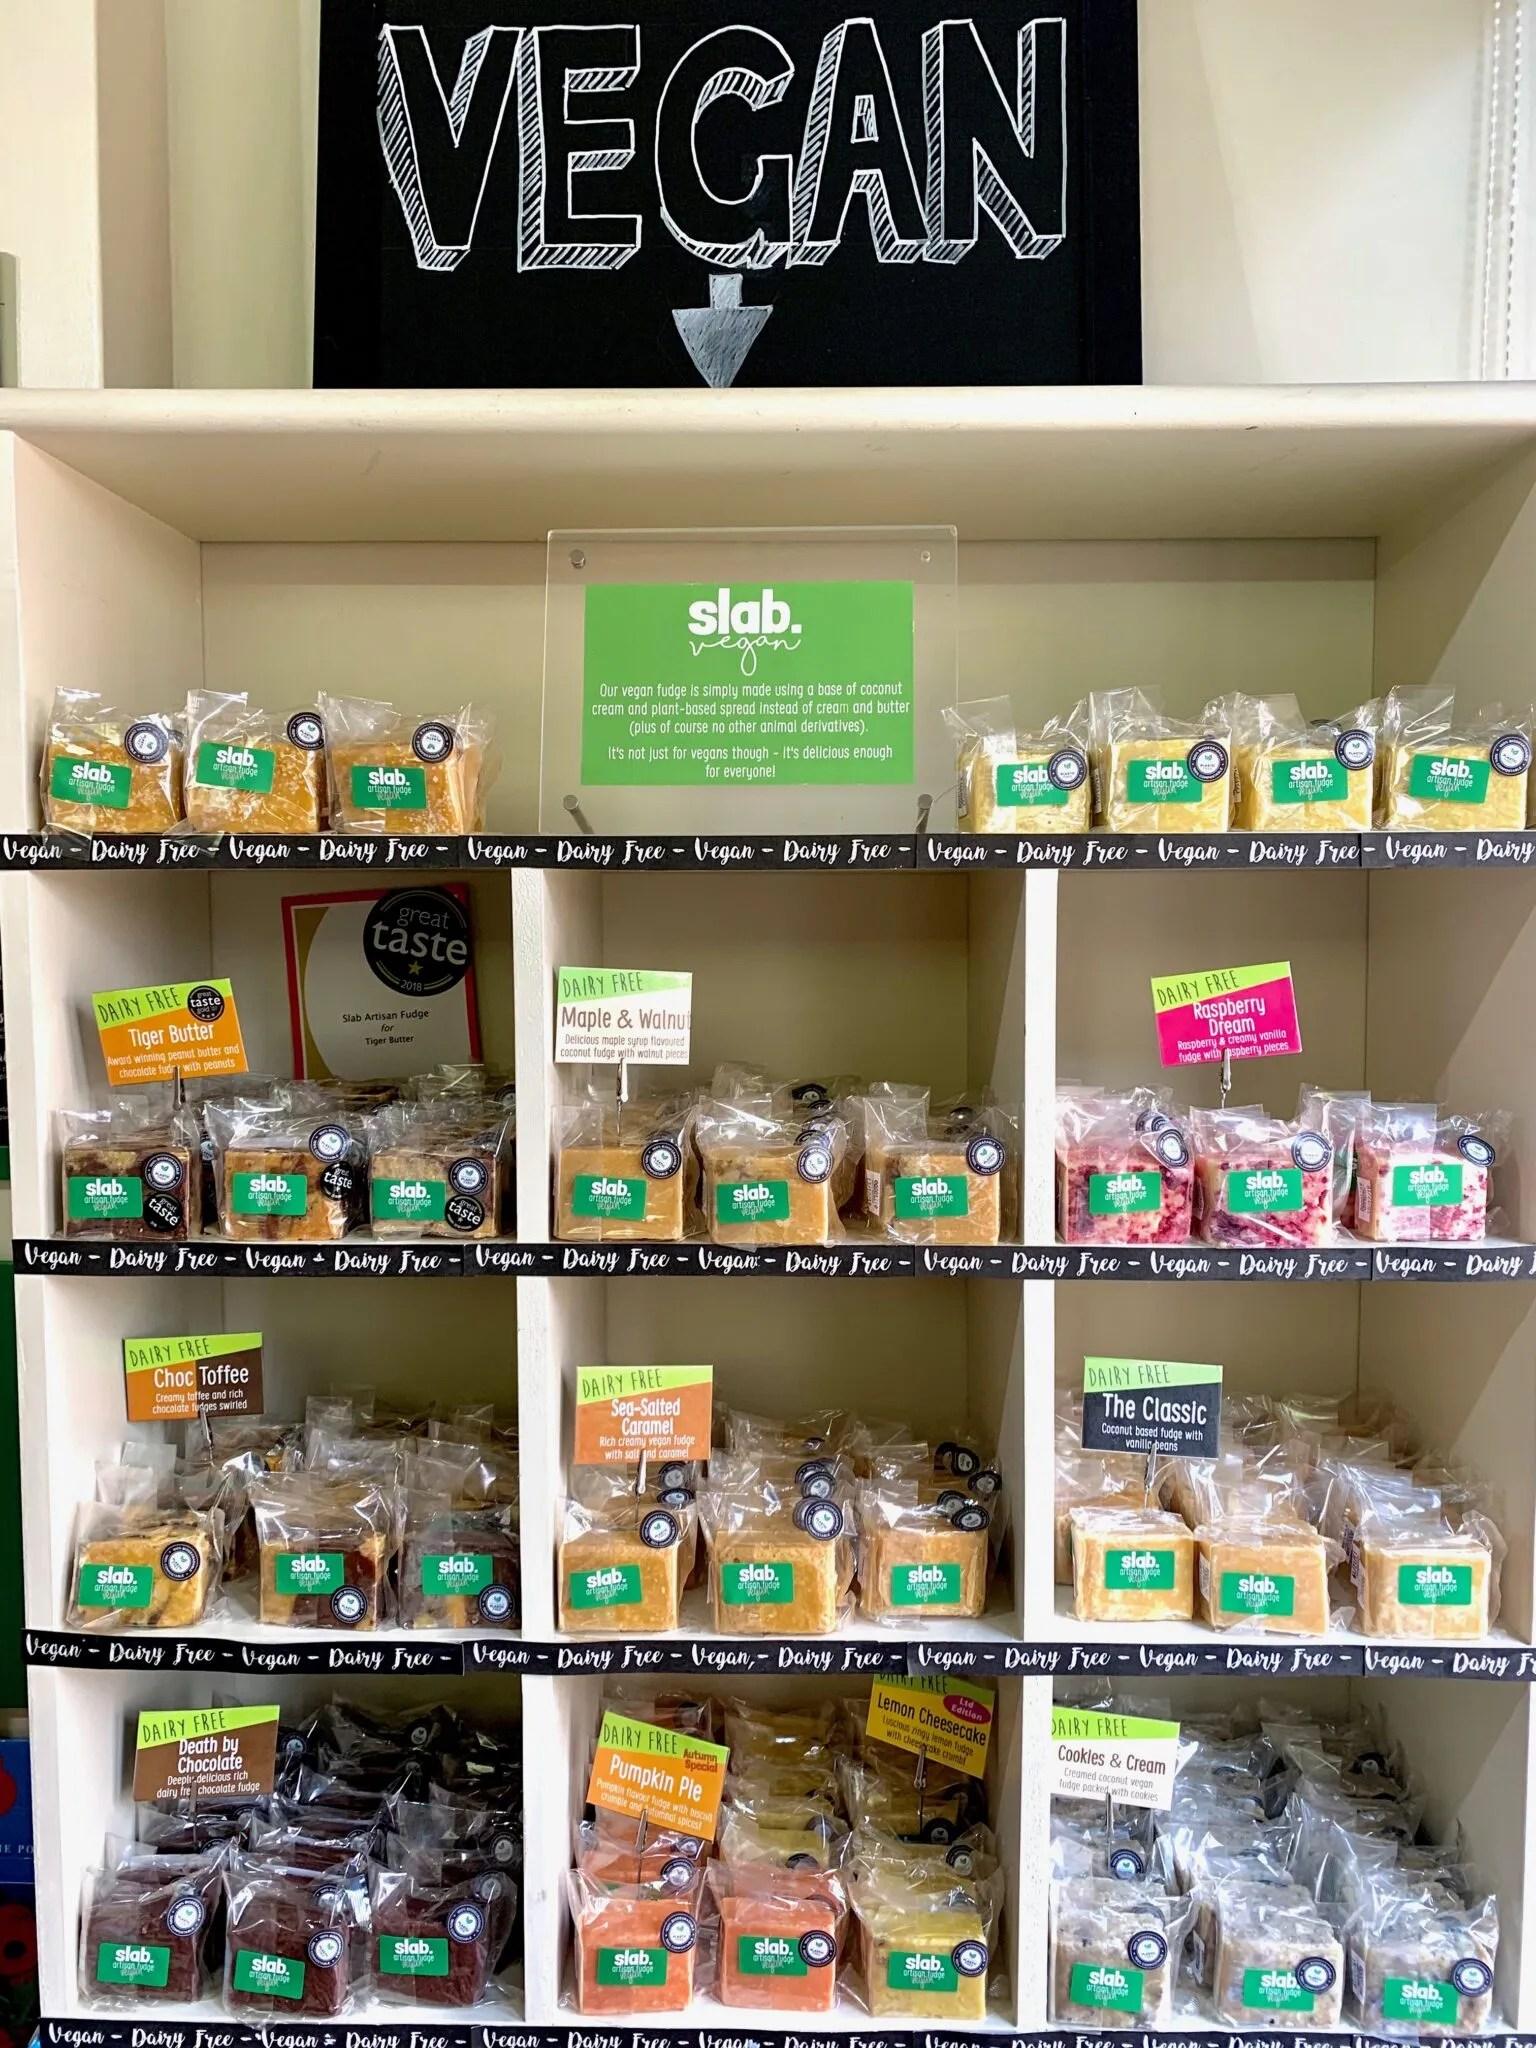 Slab Artisan Fudge - Shop Shelves Vegan Image 1